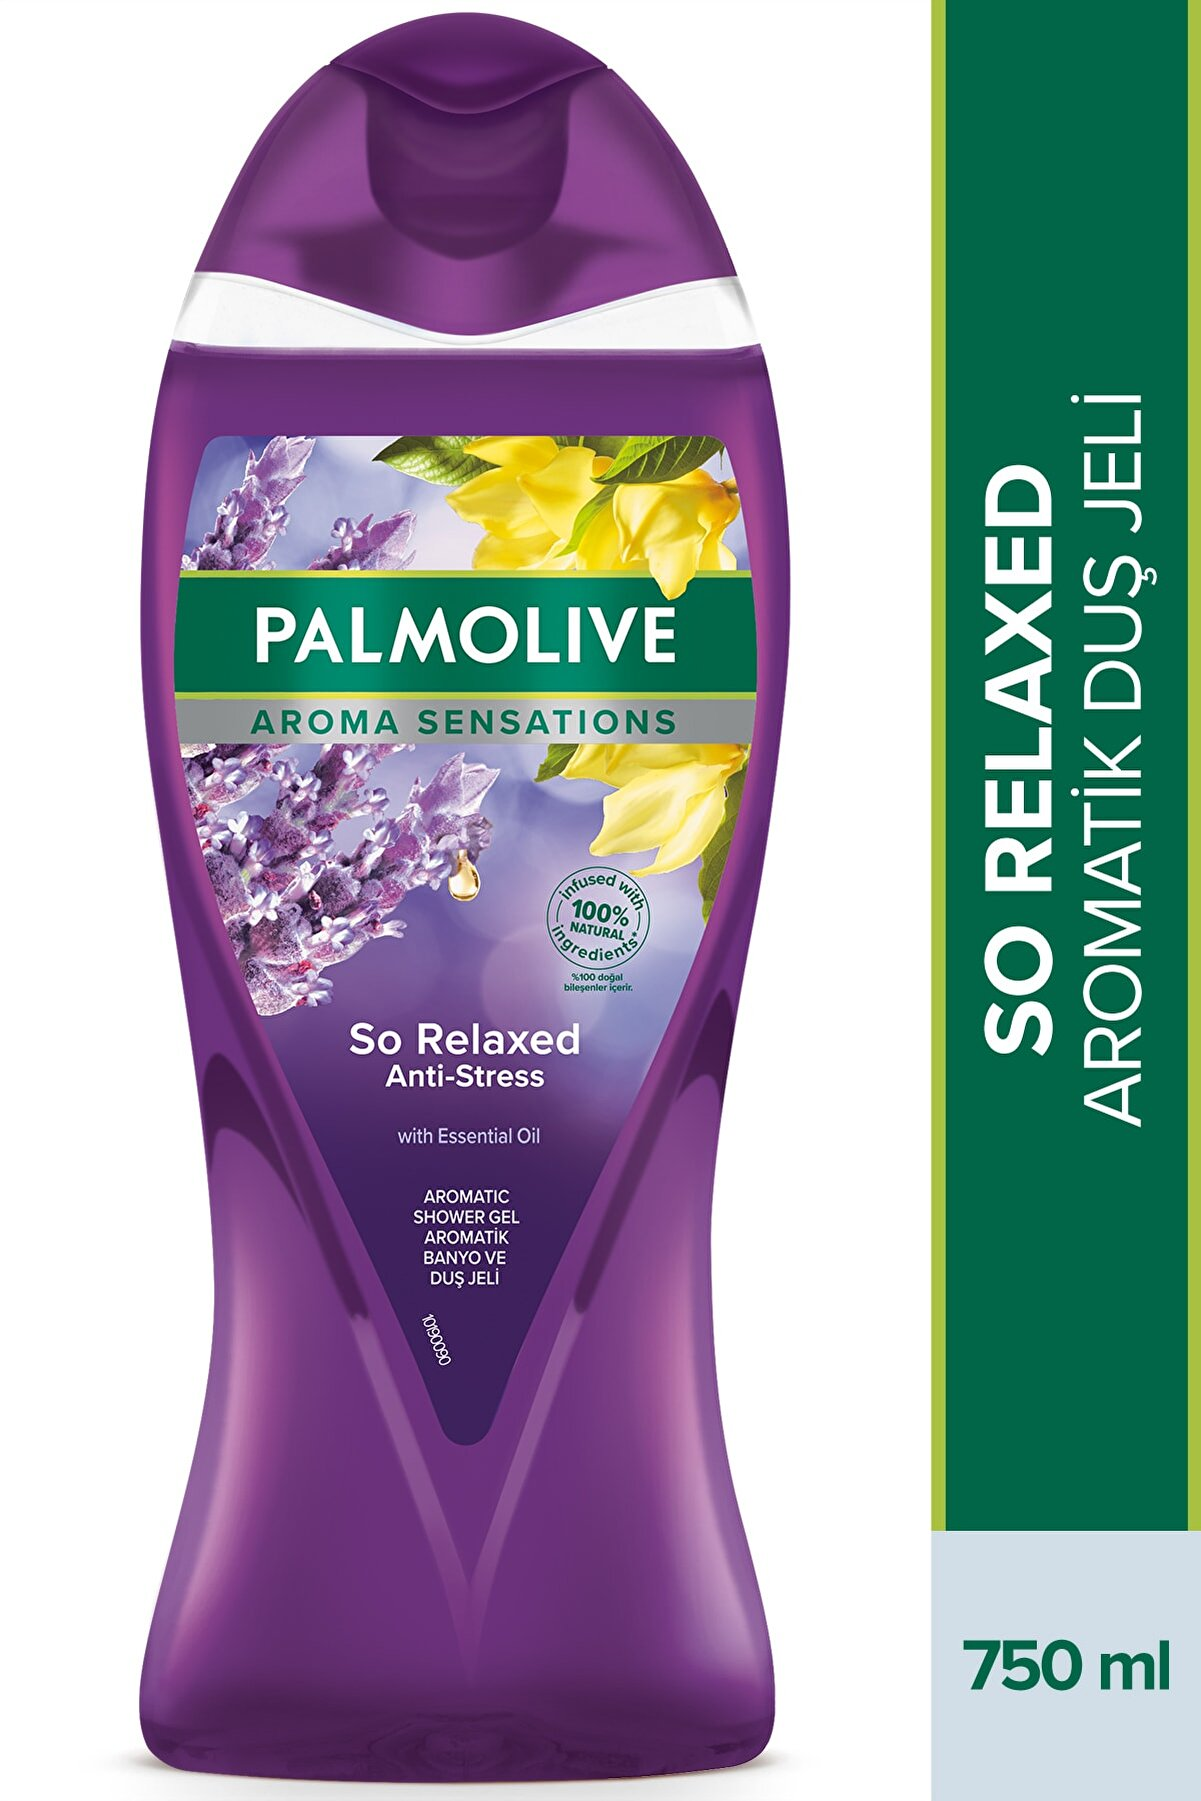 Palmolive Aroma Sensations So Relaxed Aromatik Banyo ve Duş Jeli 750 ml